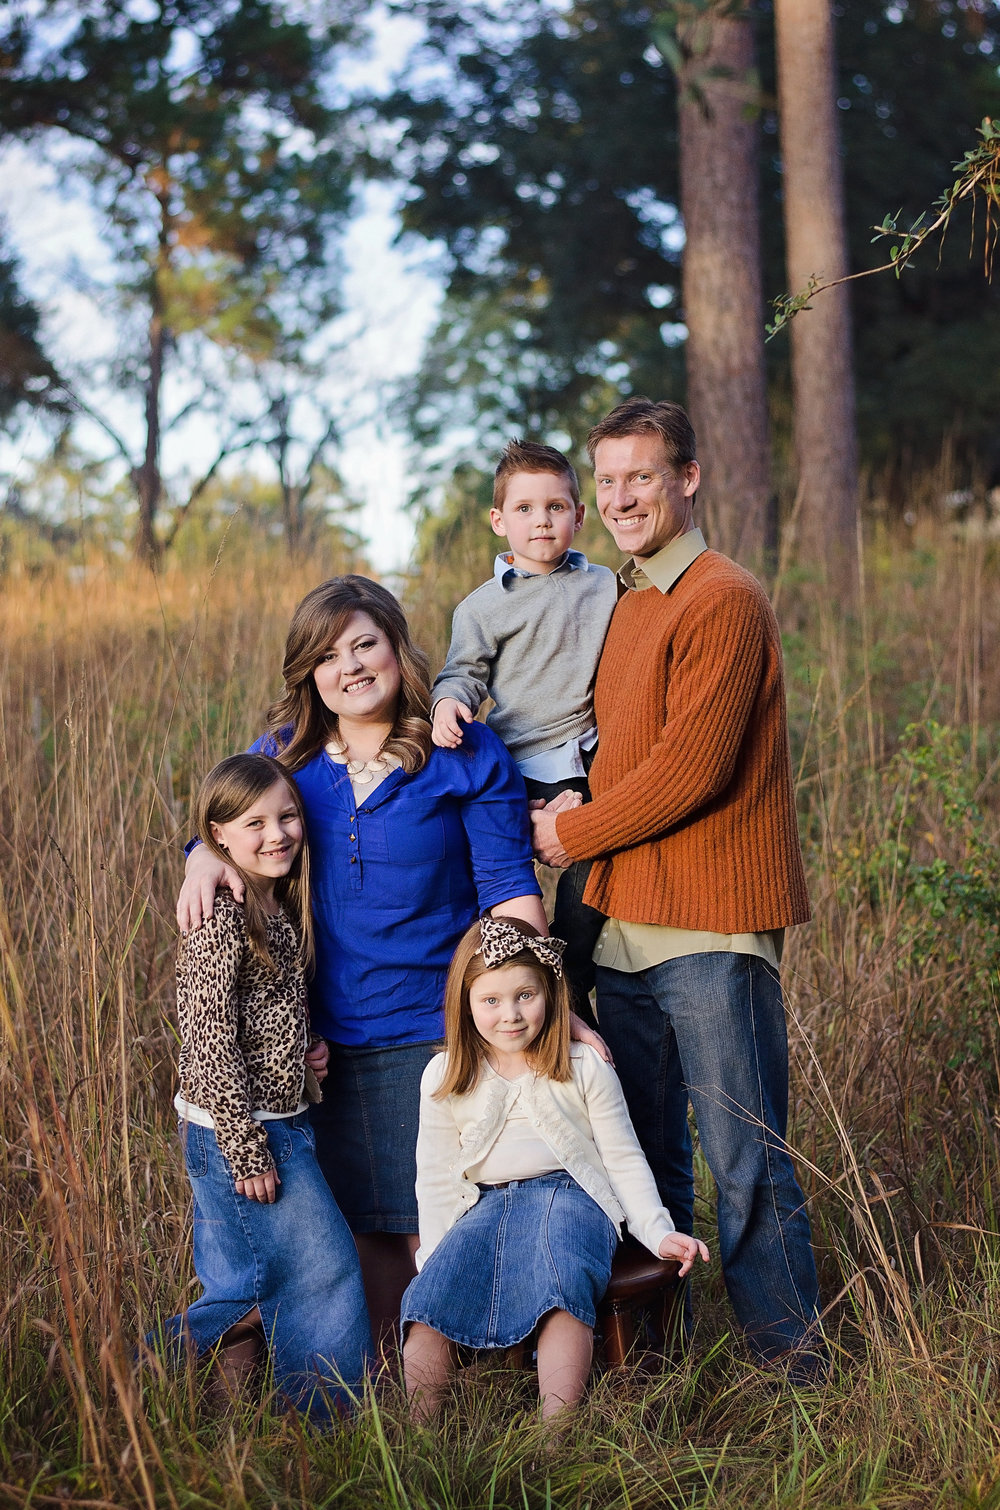 Zearing Family 11 19 13-Print Ready-0005.jpg